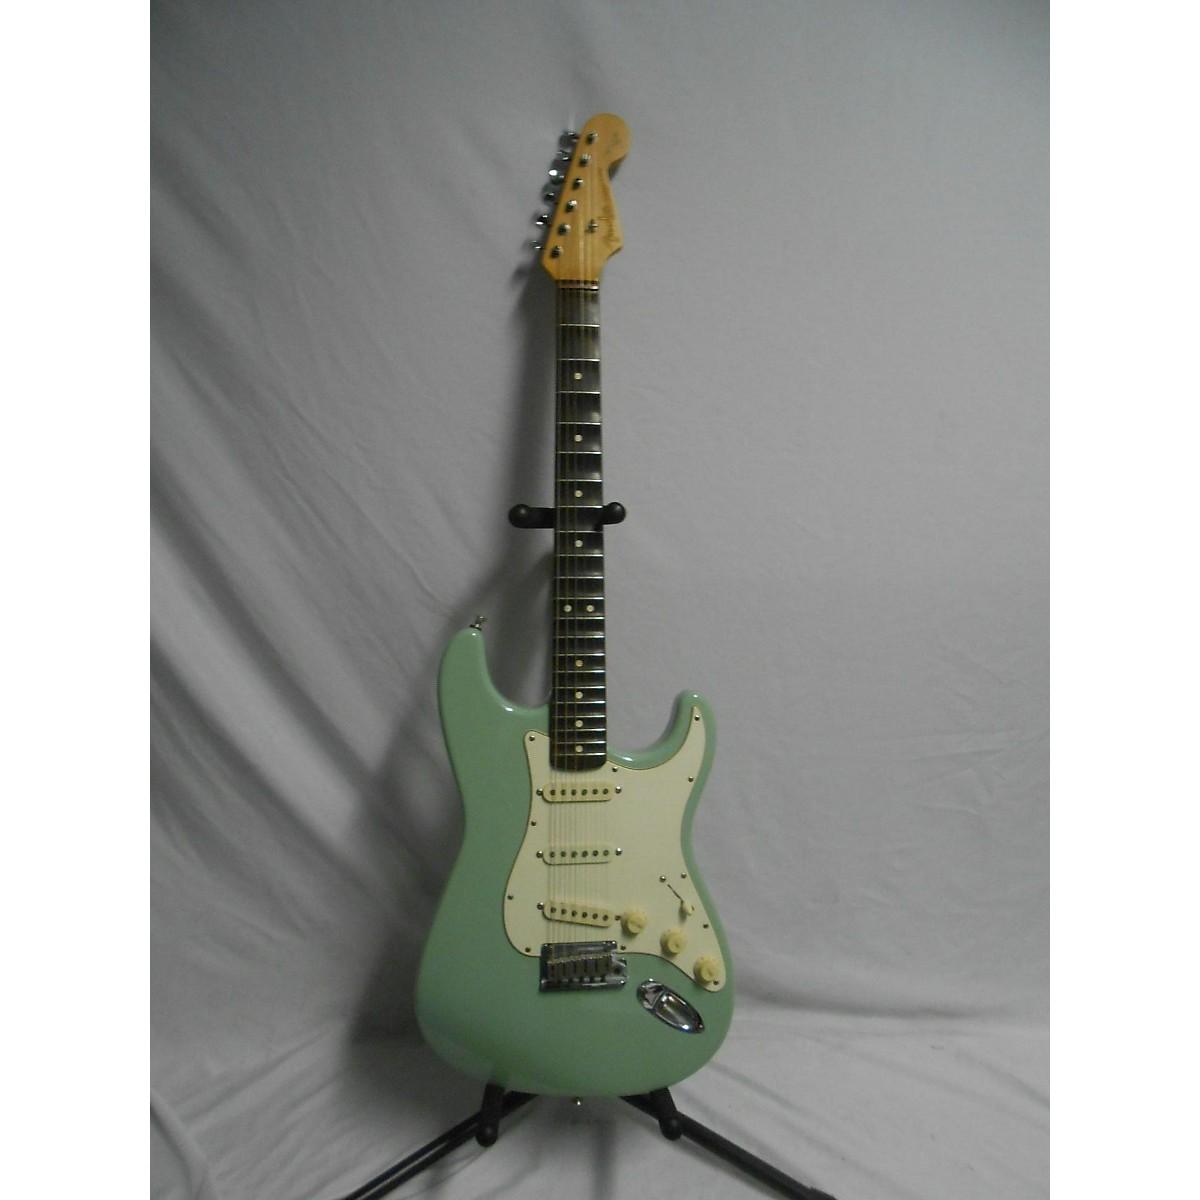 Fender 1989 Early Fender Malmsteen Strat Blue RW Board Solid Body Electric Guitar